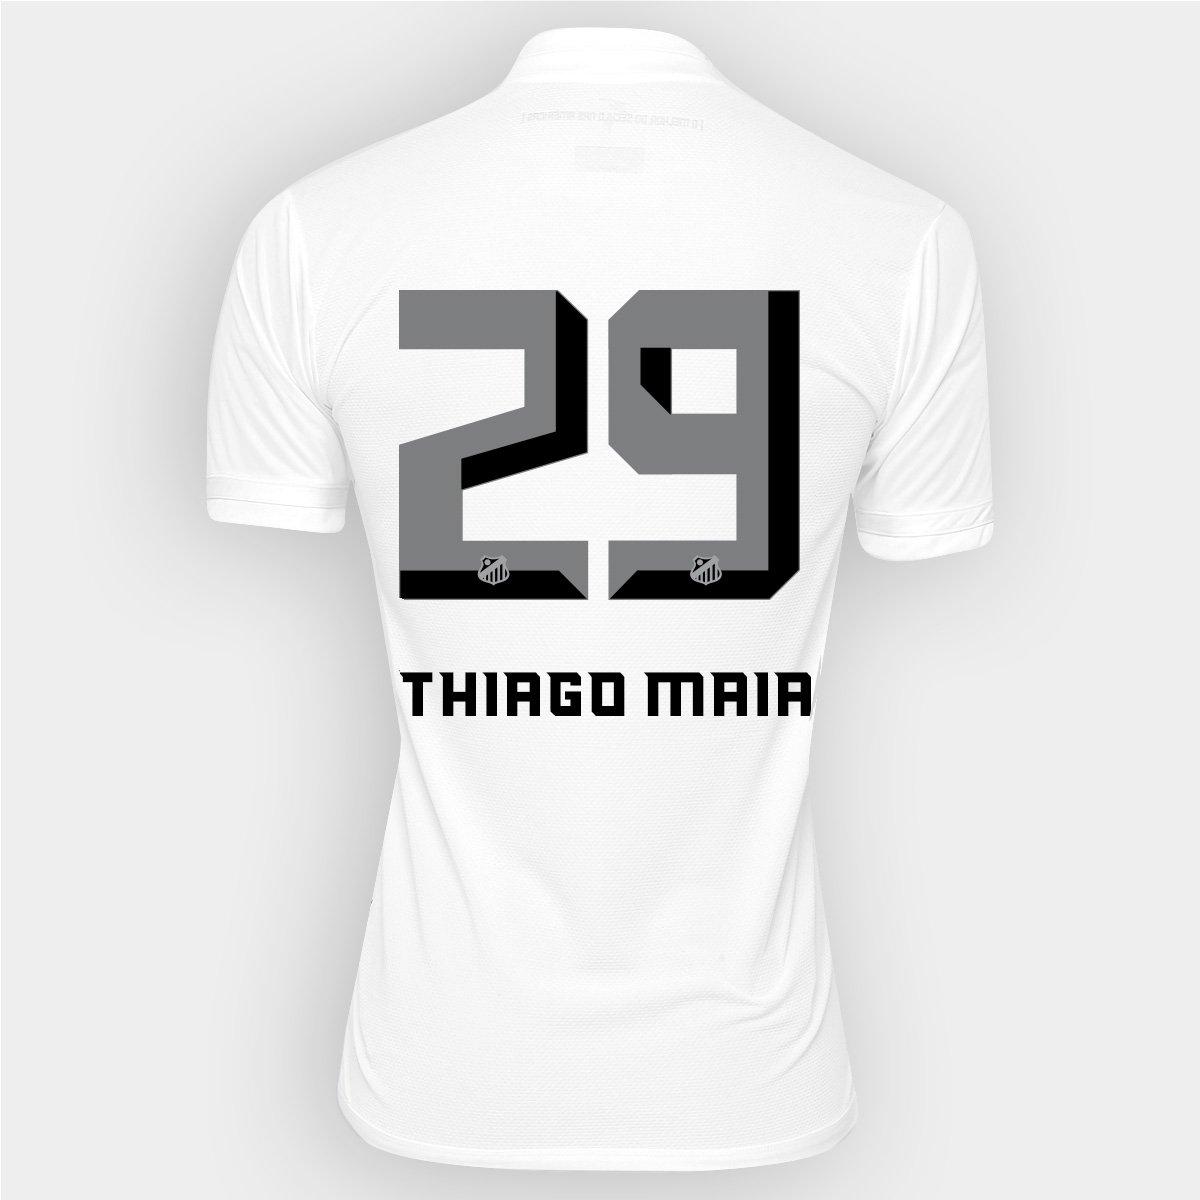 1eebf04436cfd Camisa Kappa Santos I 2016 nº 29 - Thiago Maia - Compre Agora